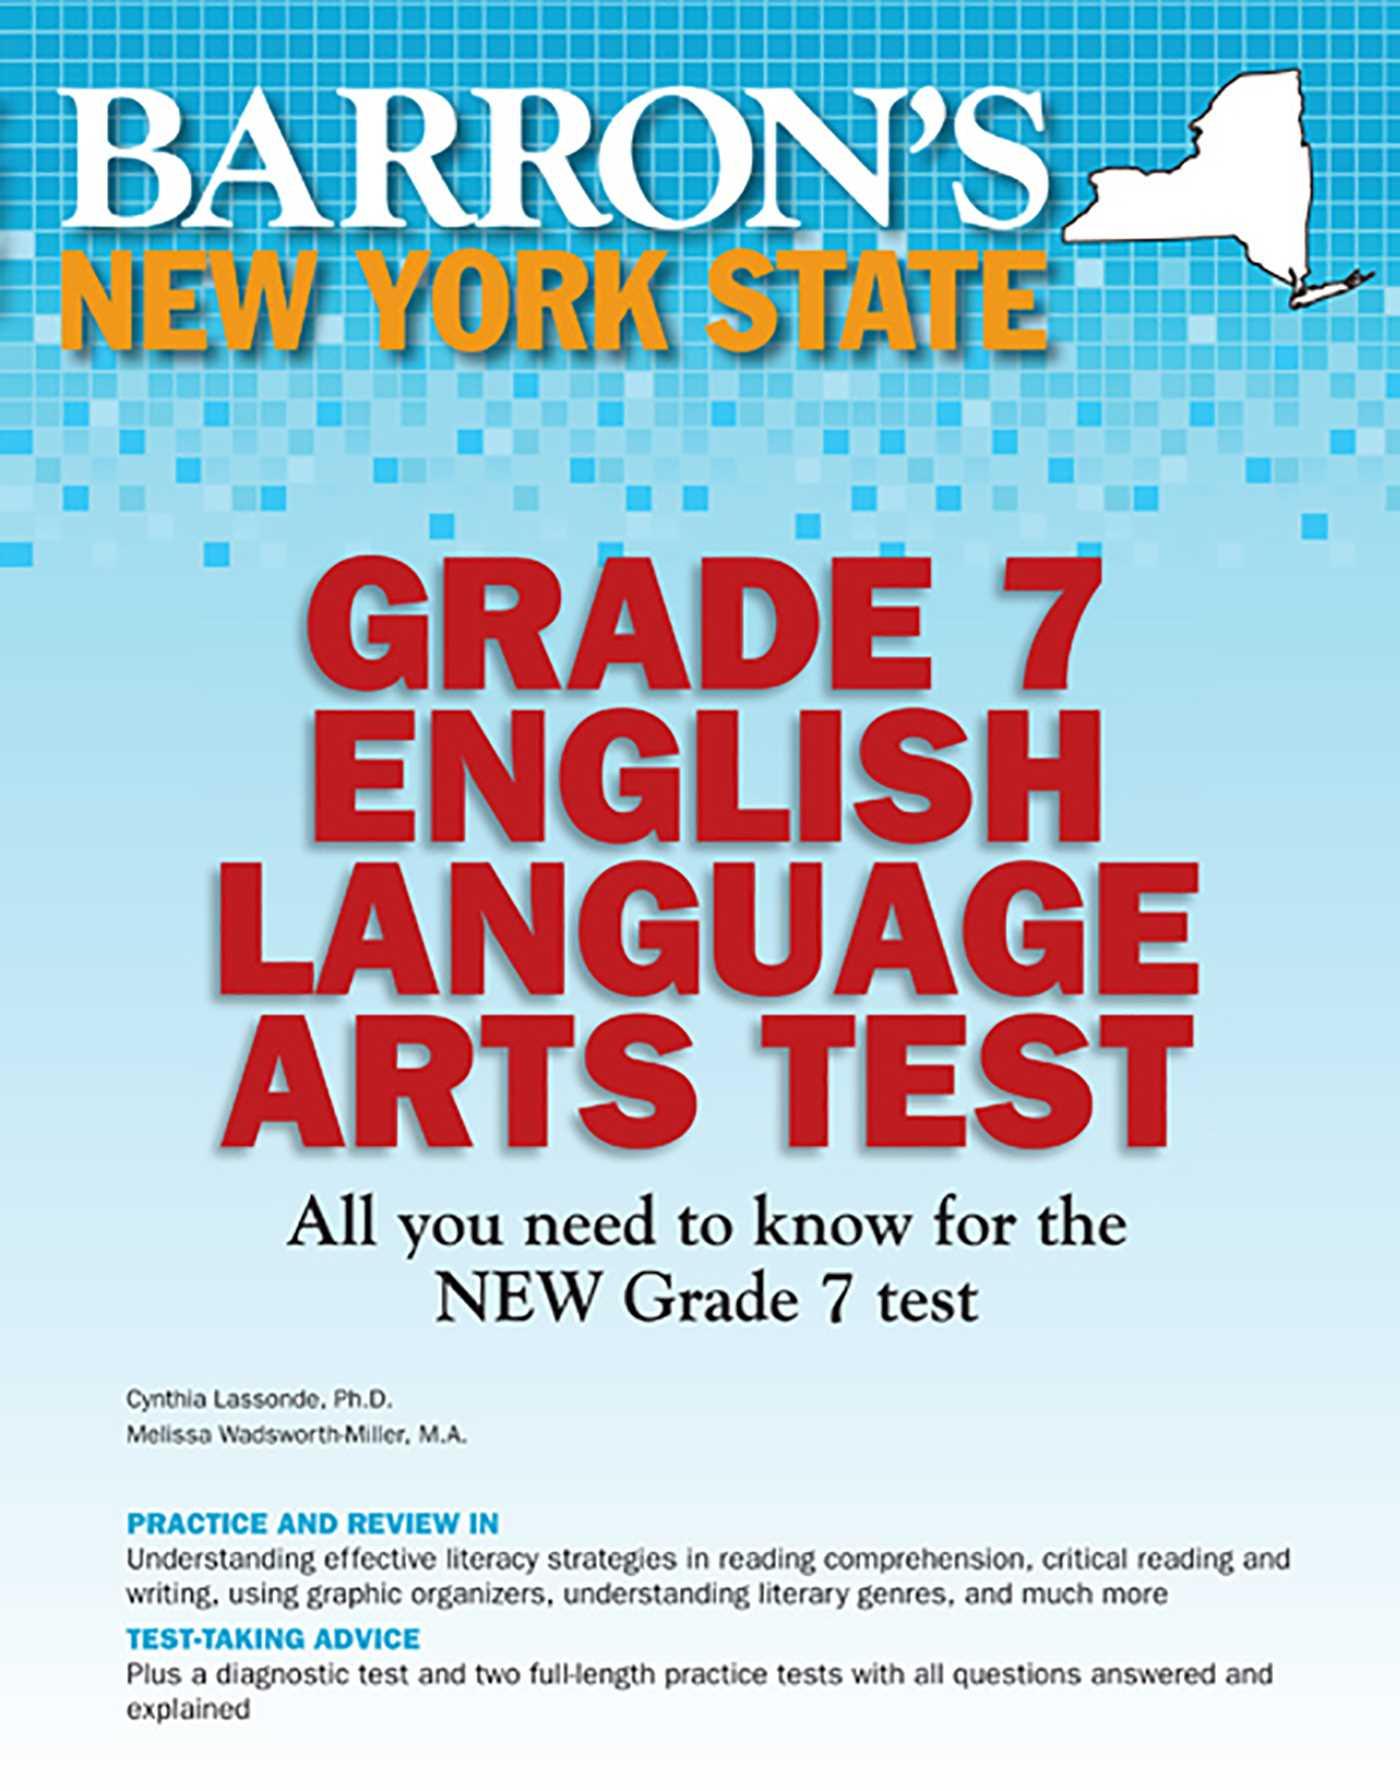 Barron's New York State Grade 7 English Language Arts Test   Book by